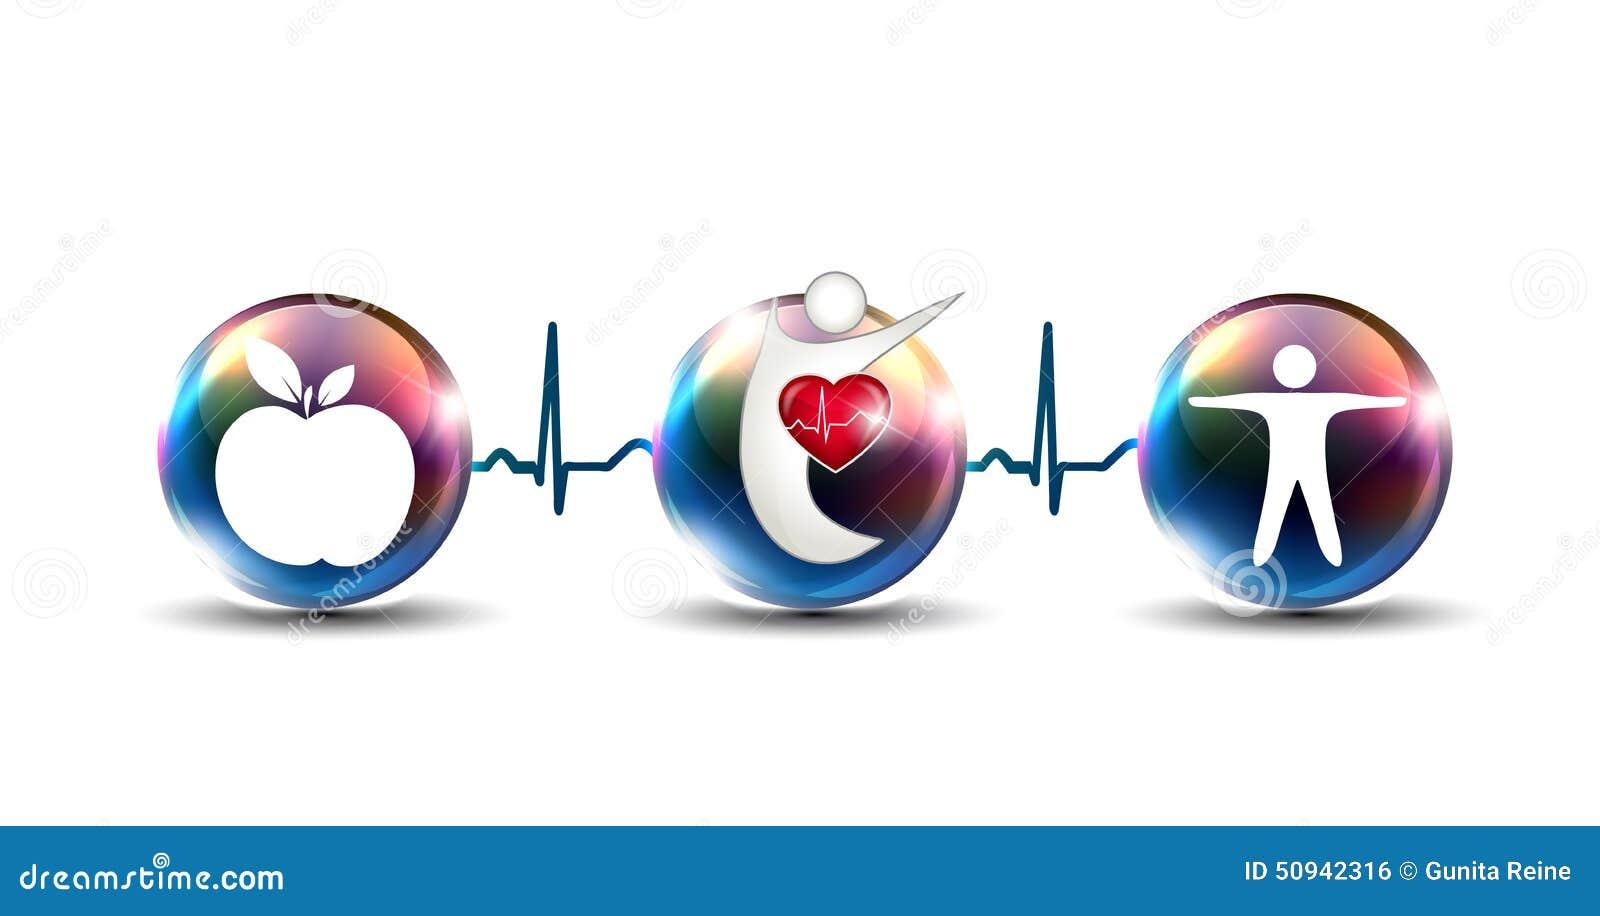 Derruba como reforçar o sistema cardiovascular